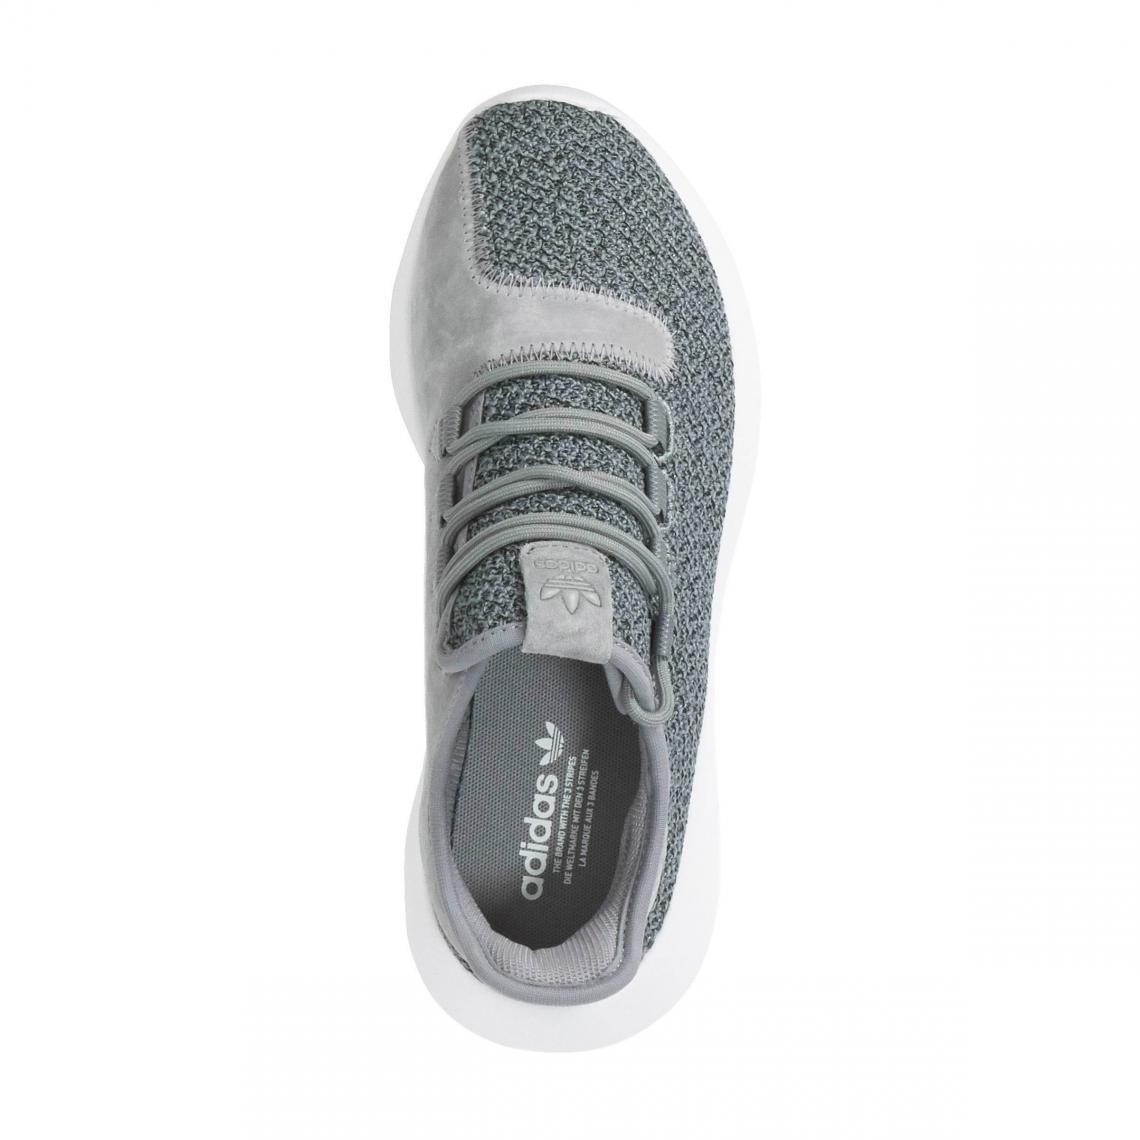 TUBULAR SHADOW W adidas Originals | 3 SUISSES